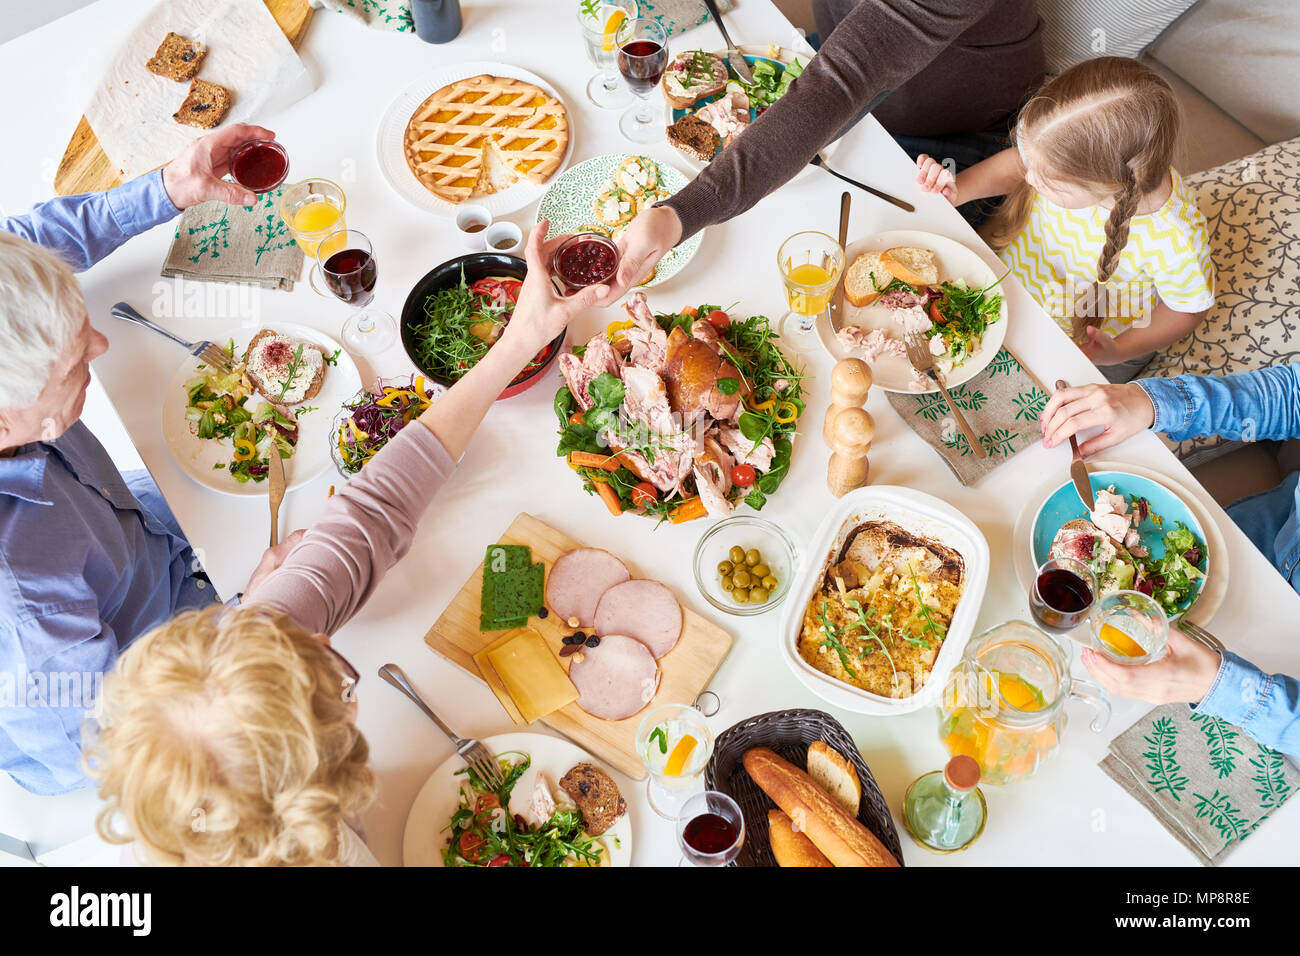 Vista anterior de la cena familiar. Imagen De Stock